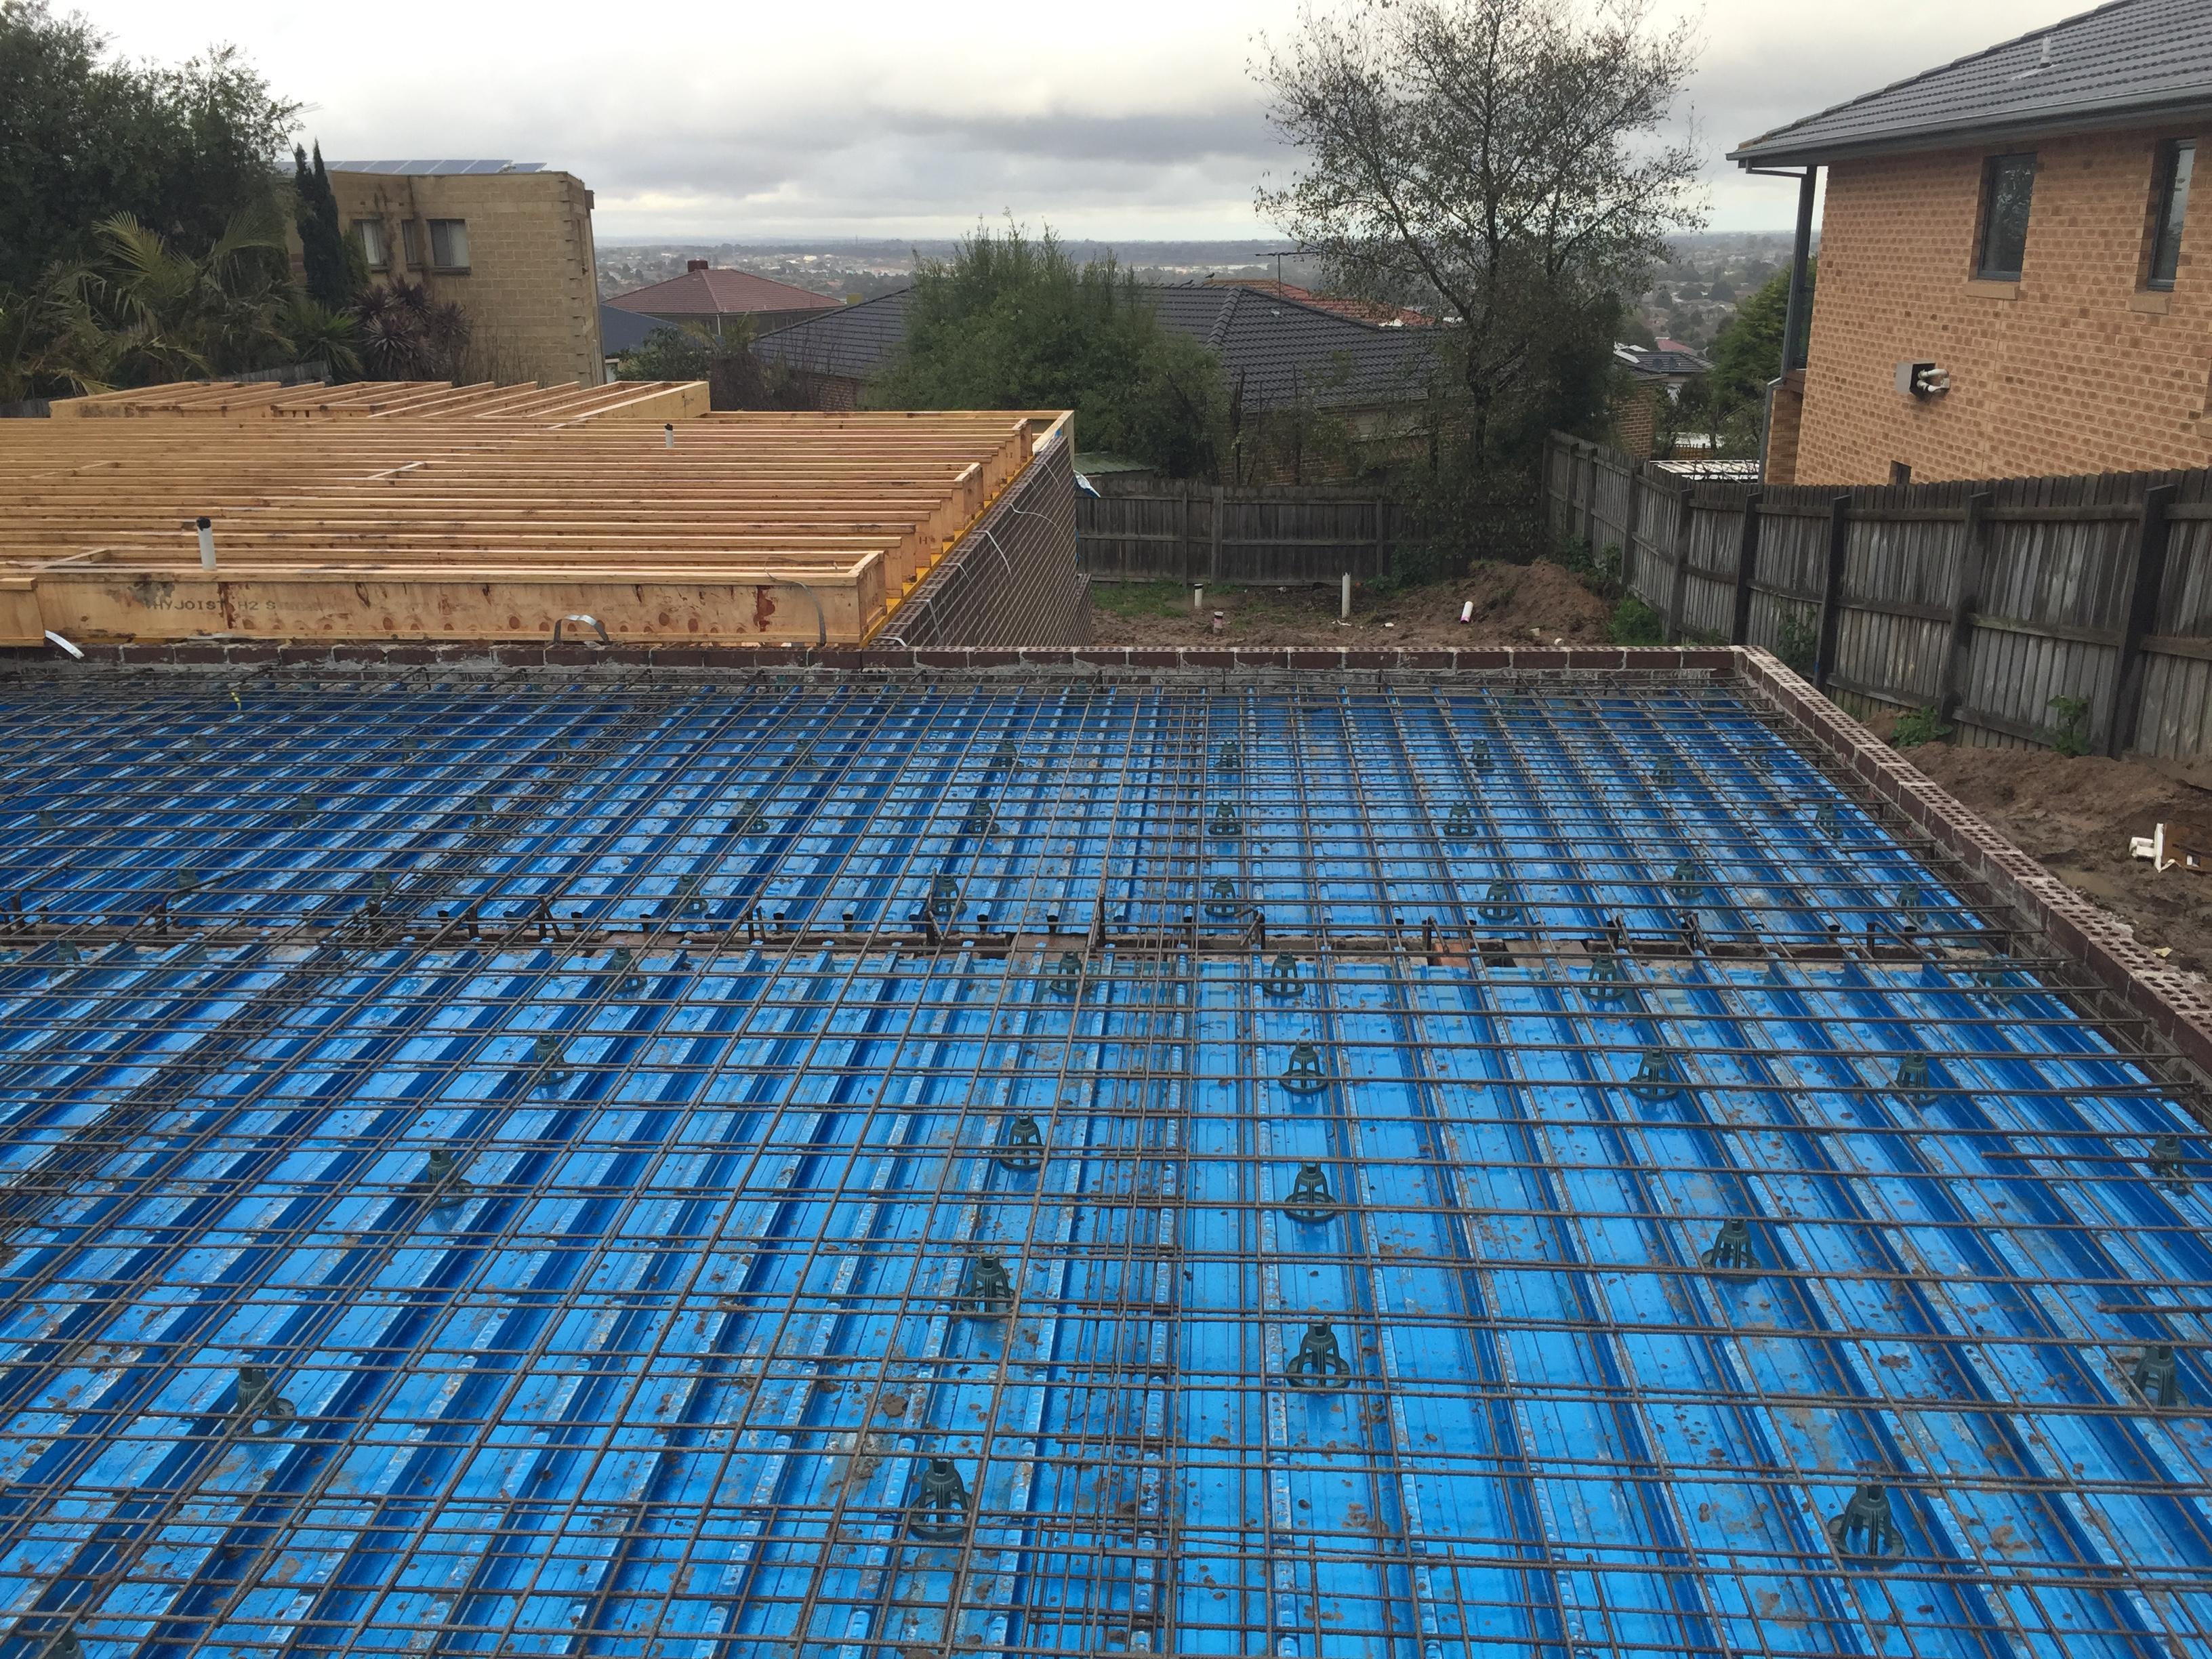 Reinforced Concrete Slab : Prior to steel reinforced concrete or sub floor stumps